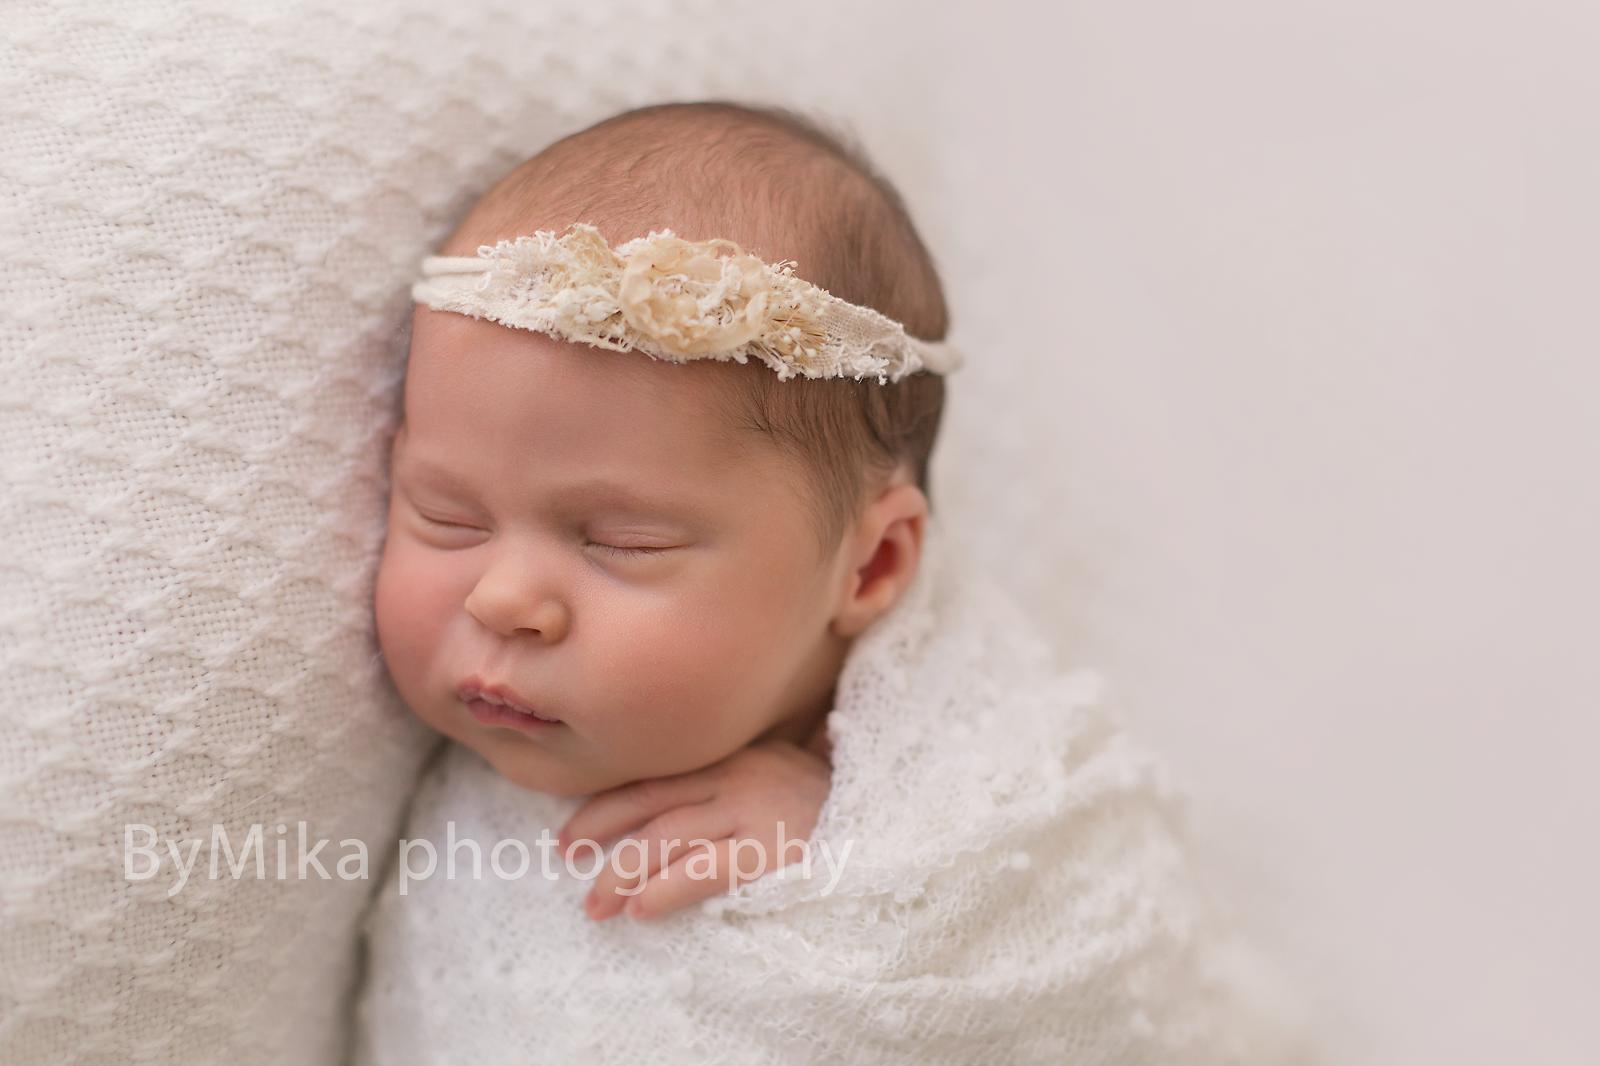 Newborn portrait on beanbag